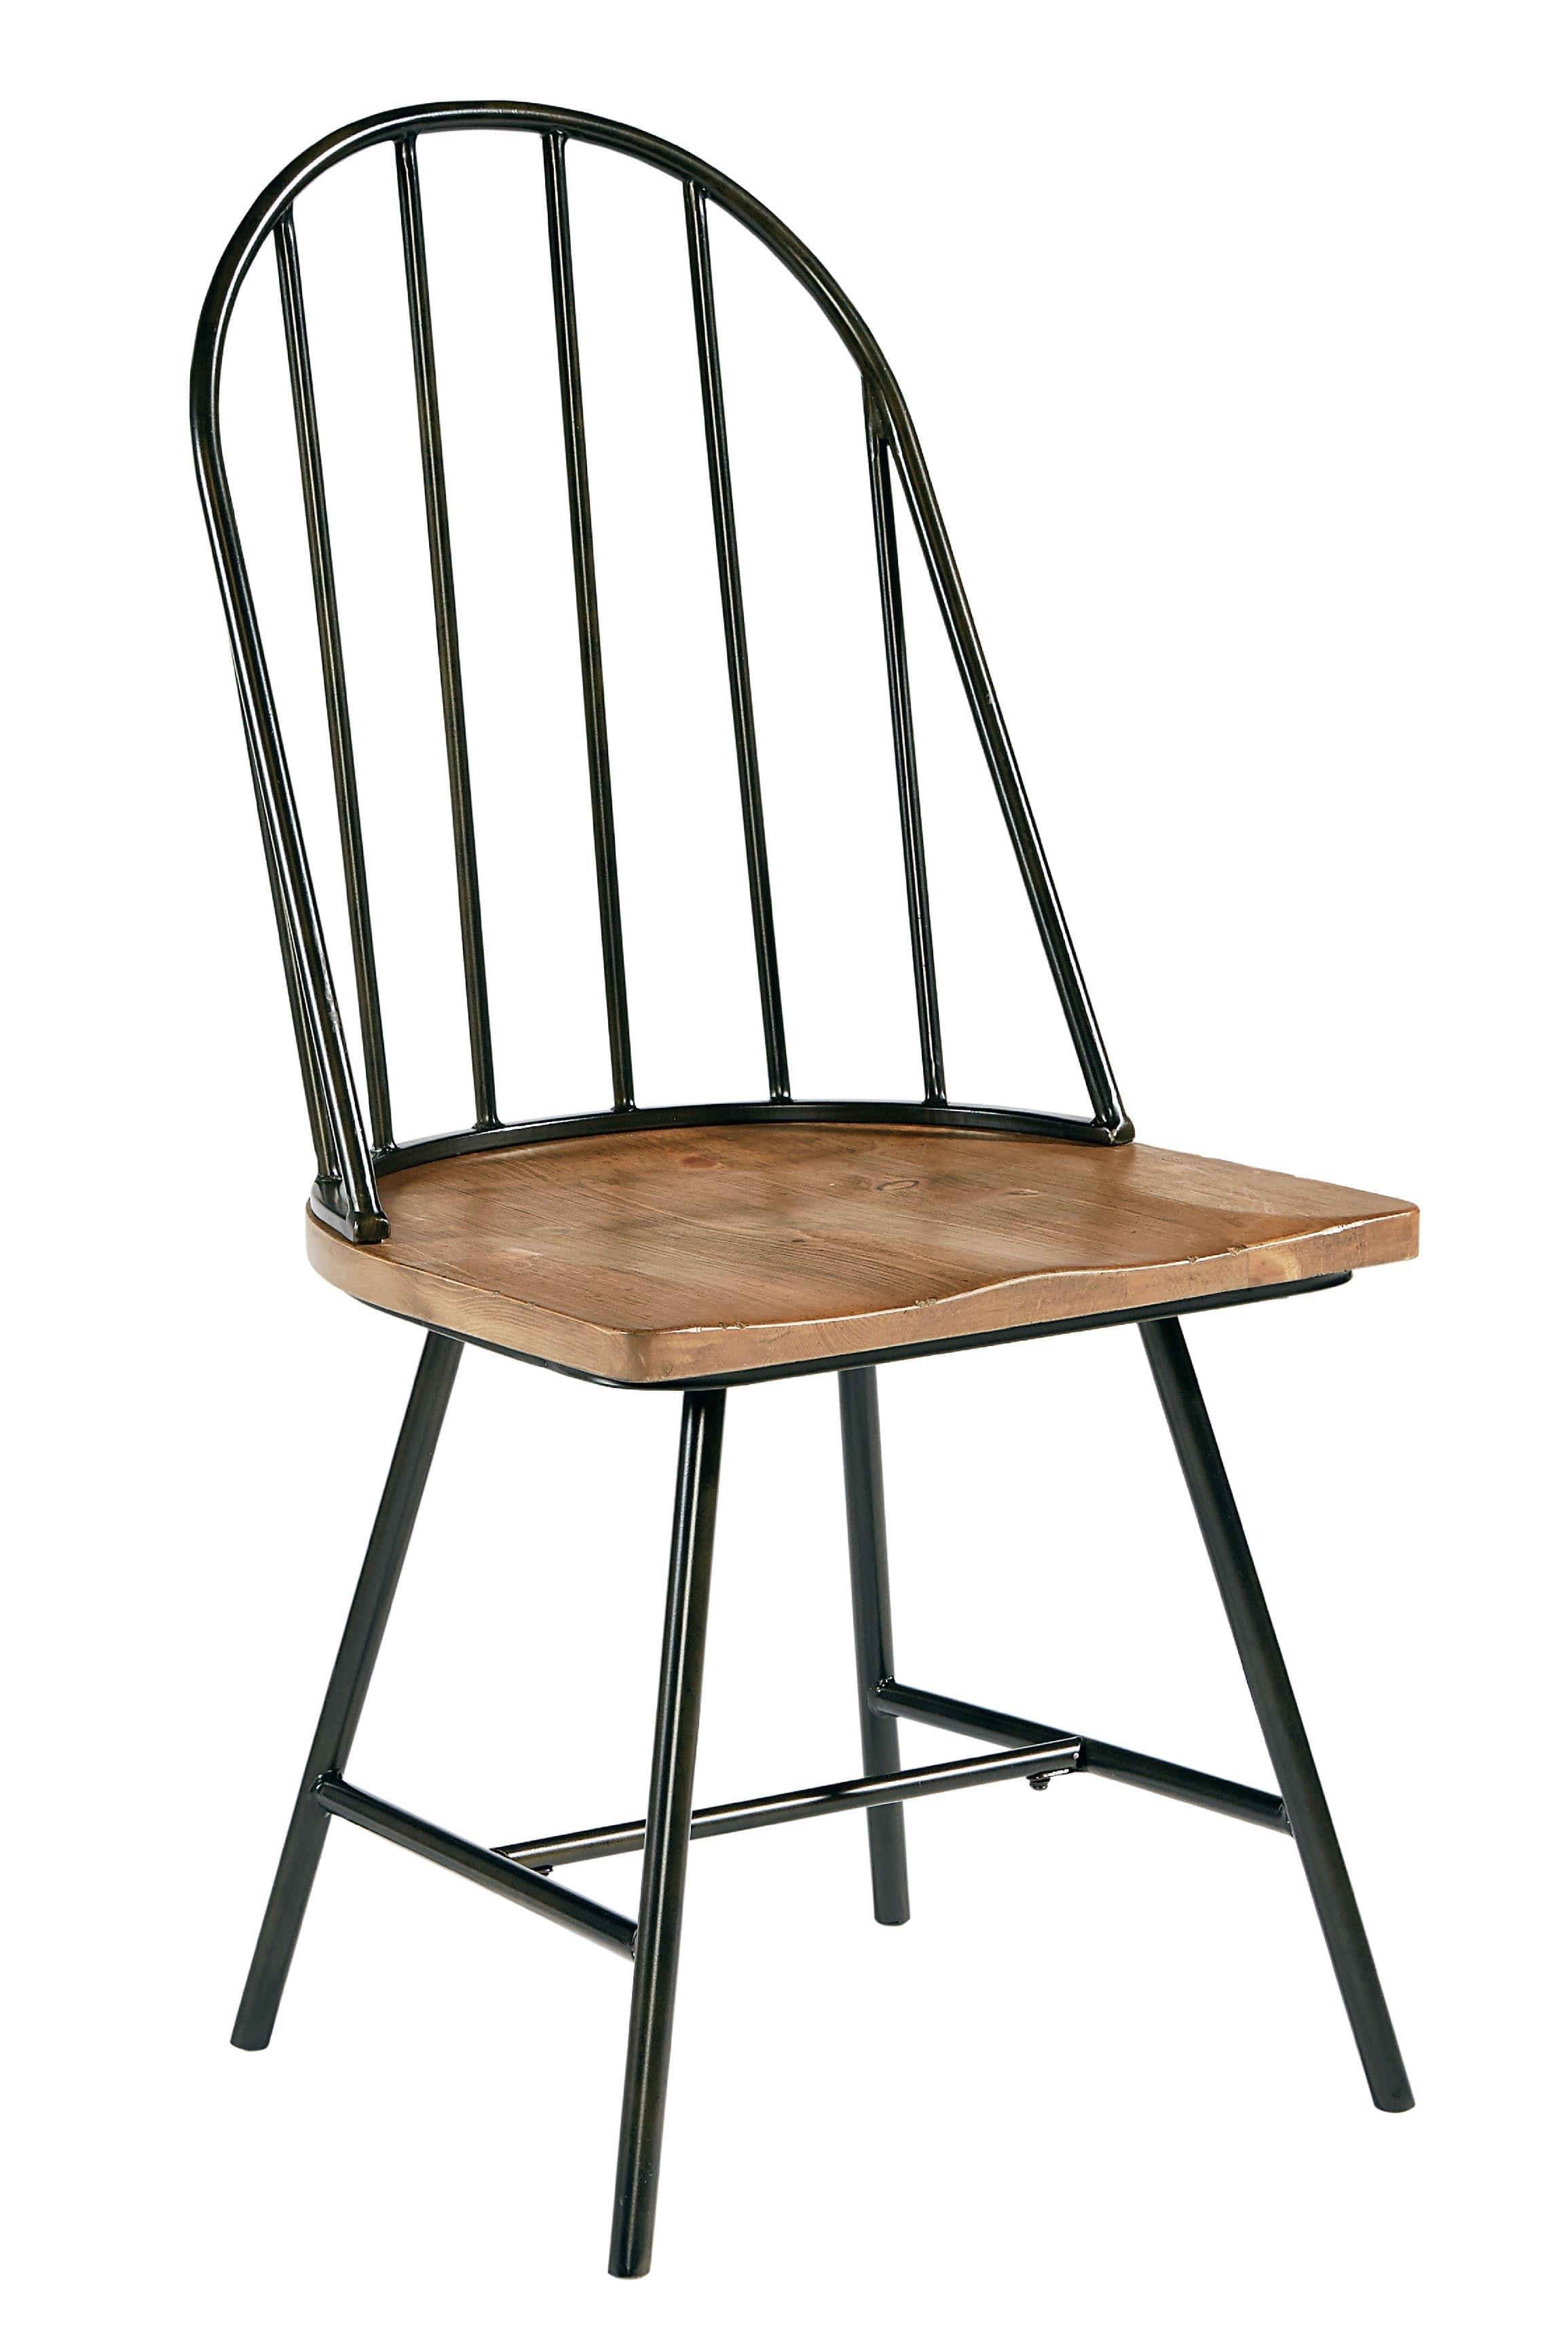 Magnolia Home – Windsor Metal And Wood Hoop Chair St: (#8 of 20)